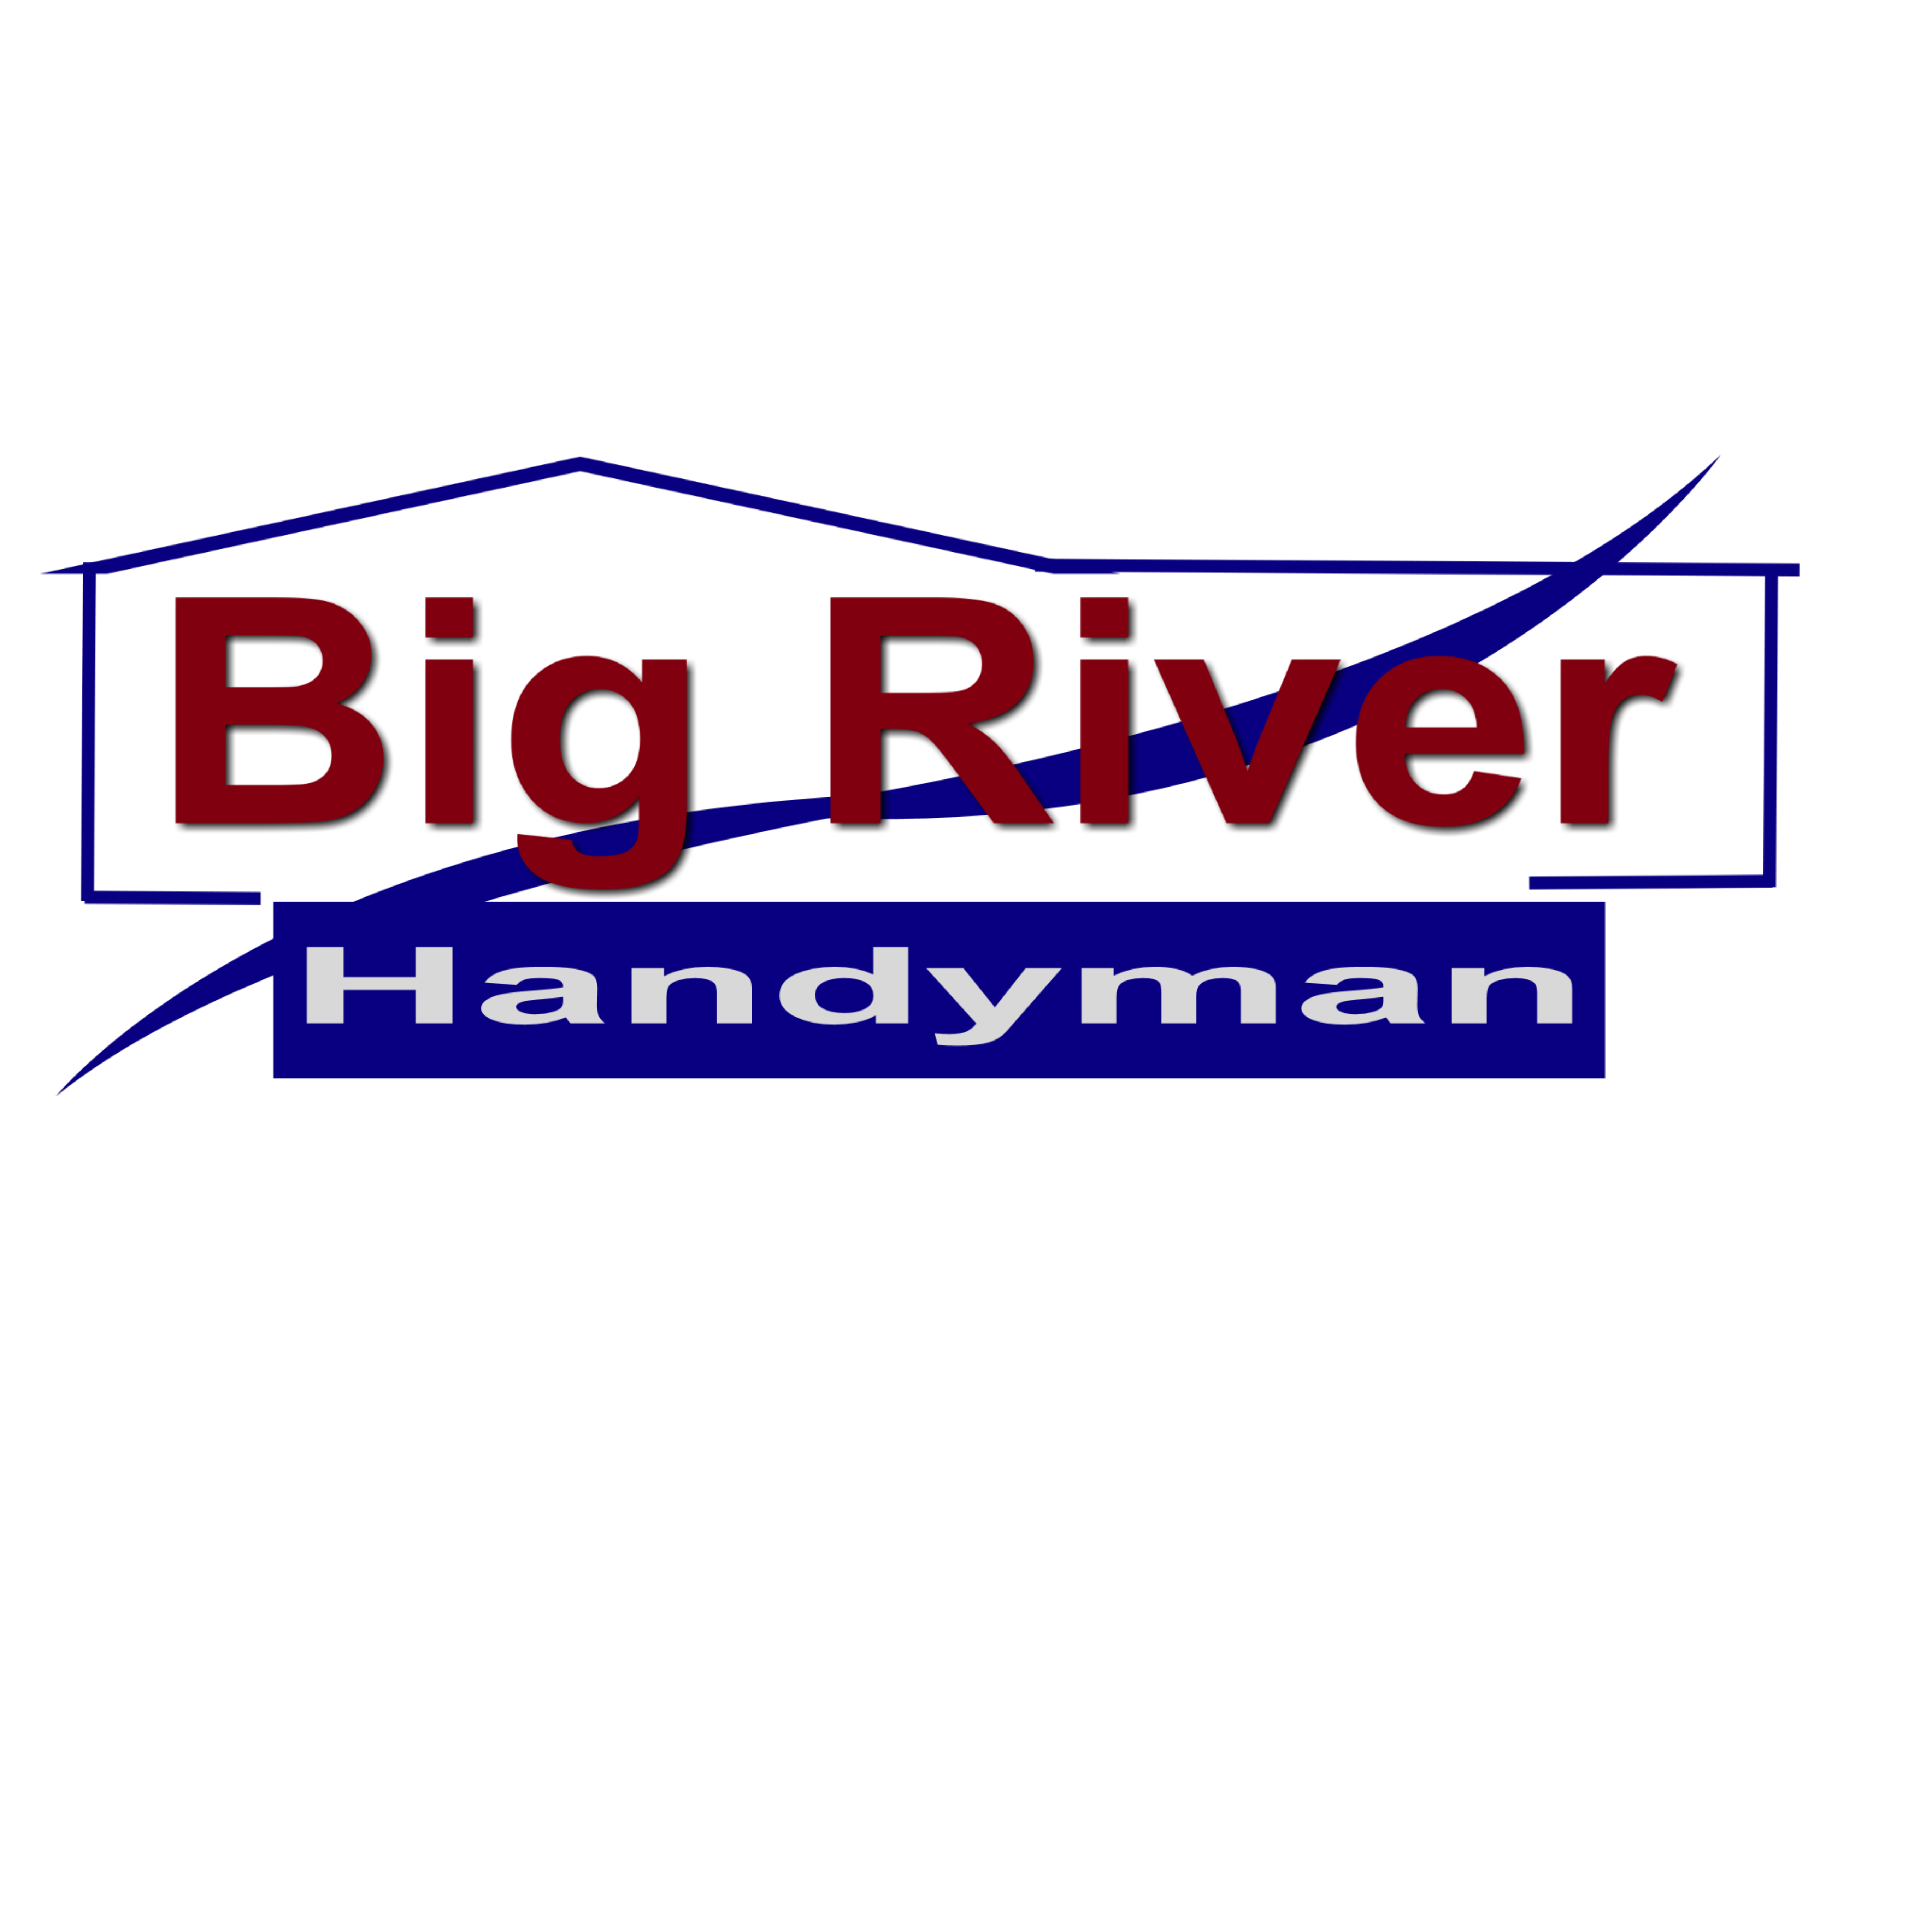 Big River Handyman